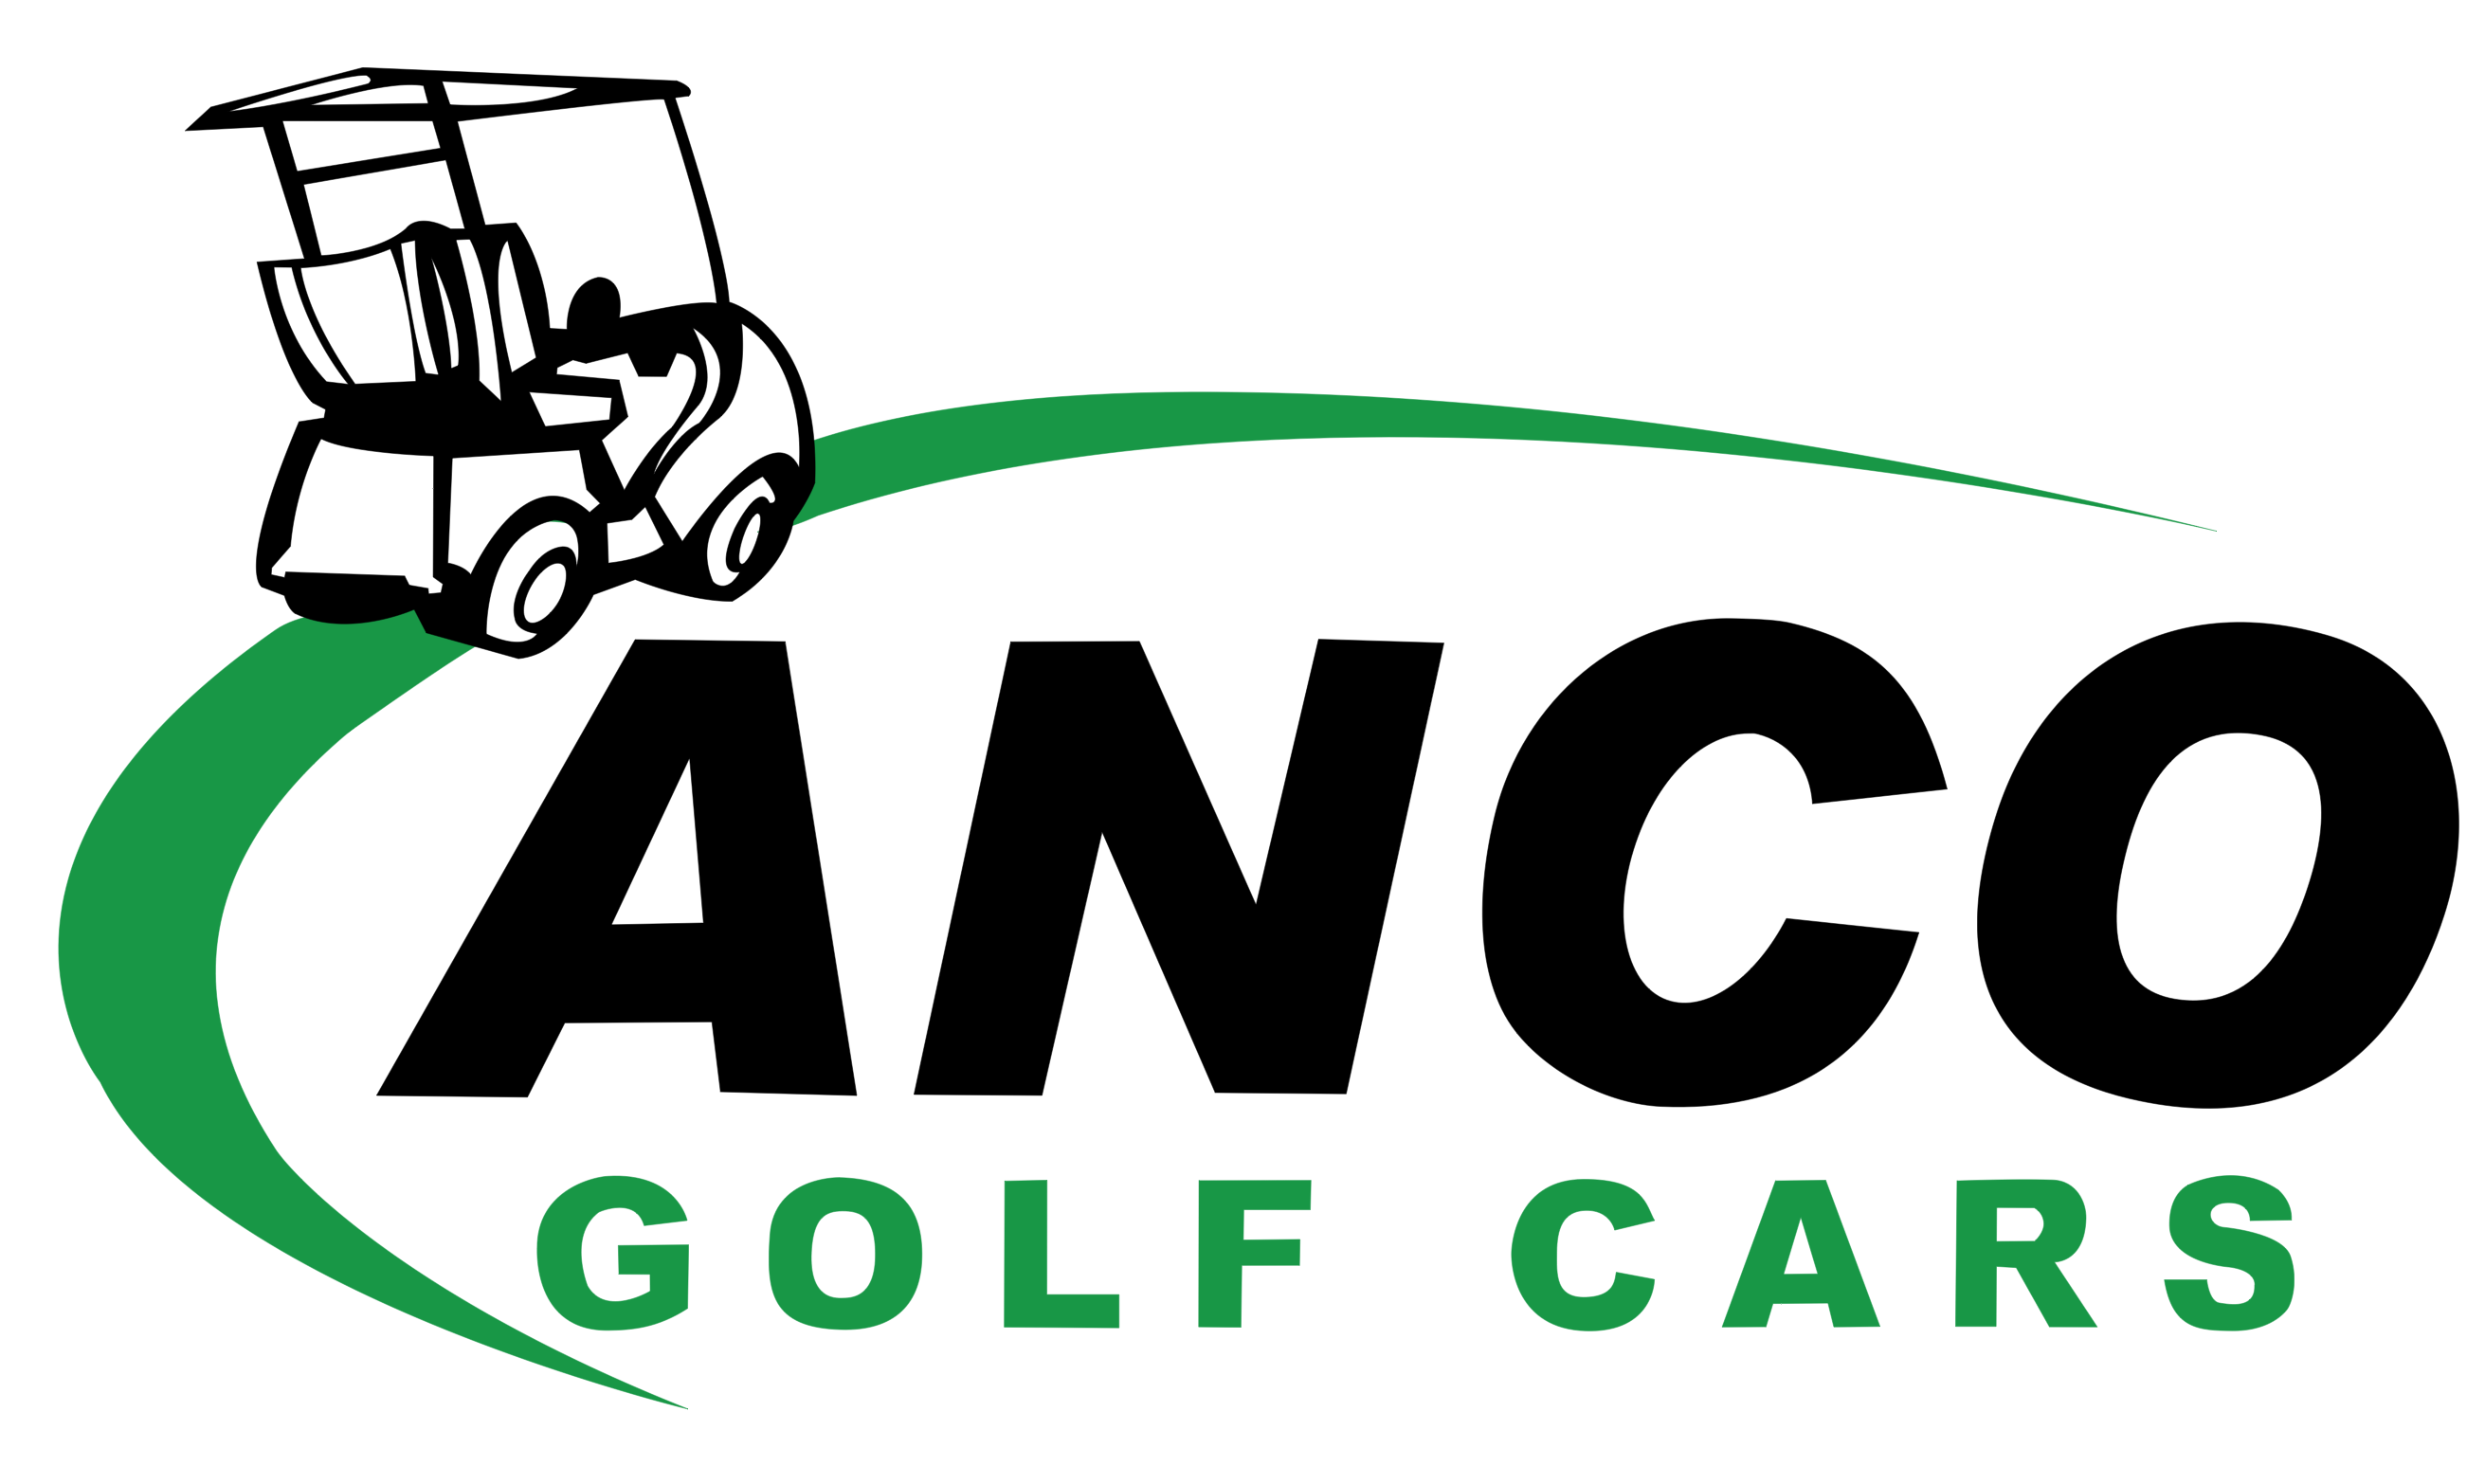 Anco Golf Cars logo